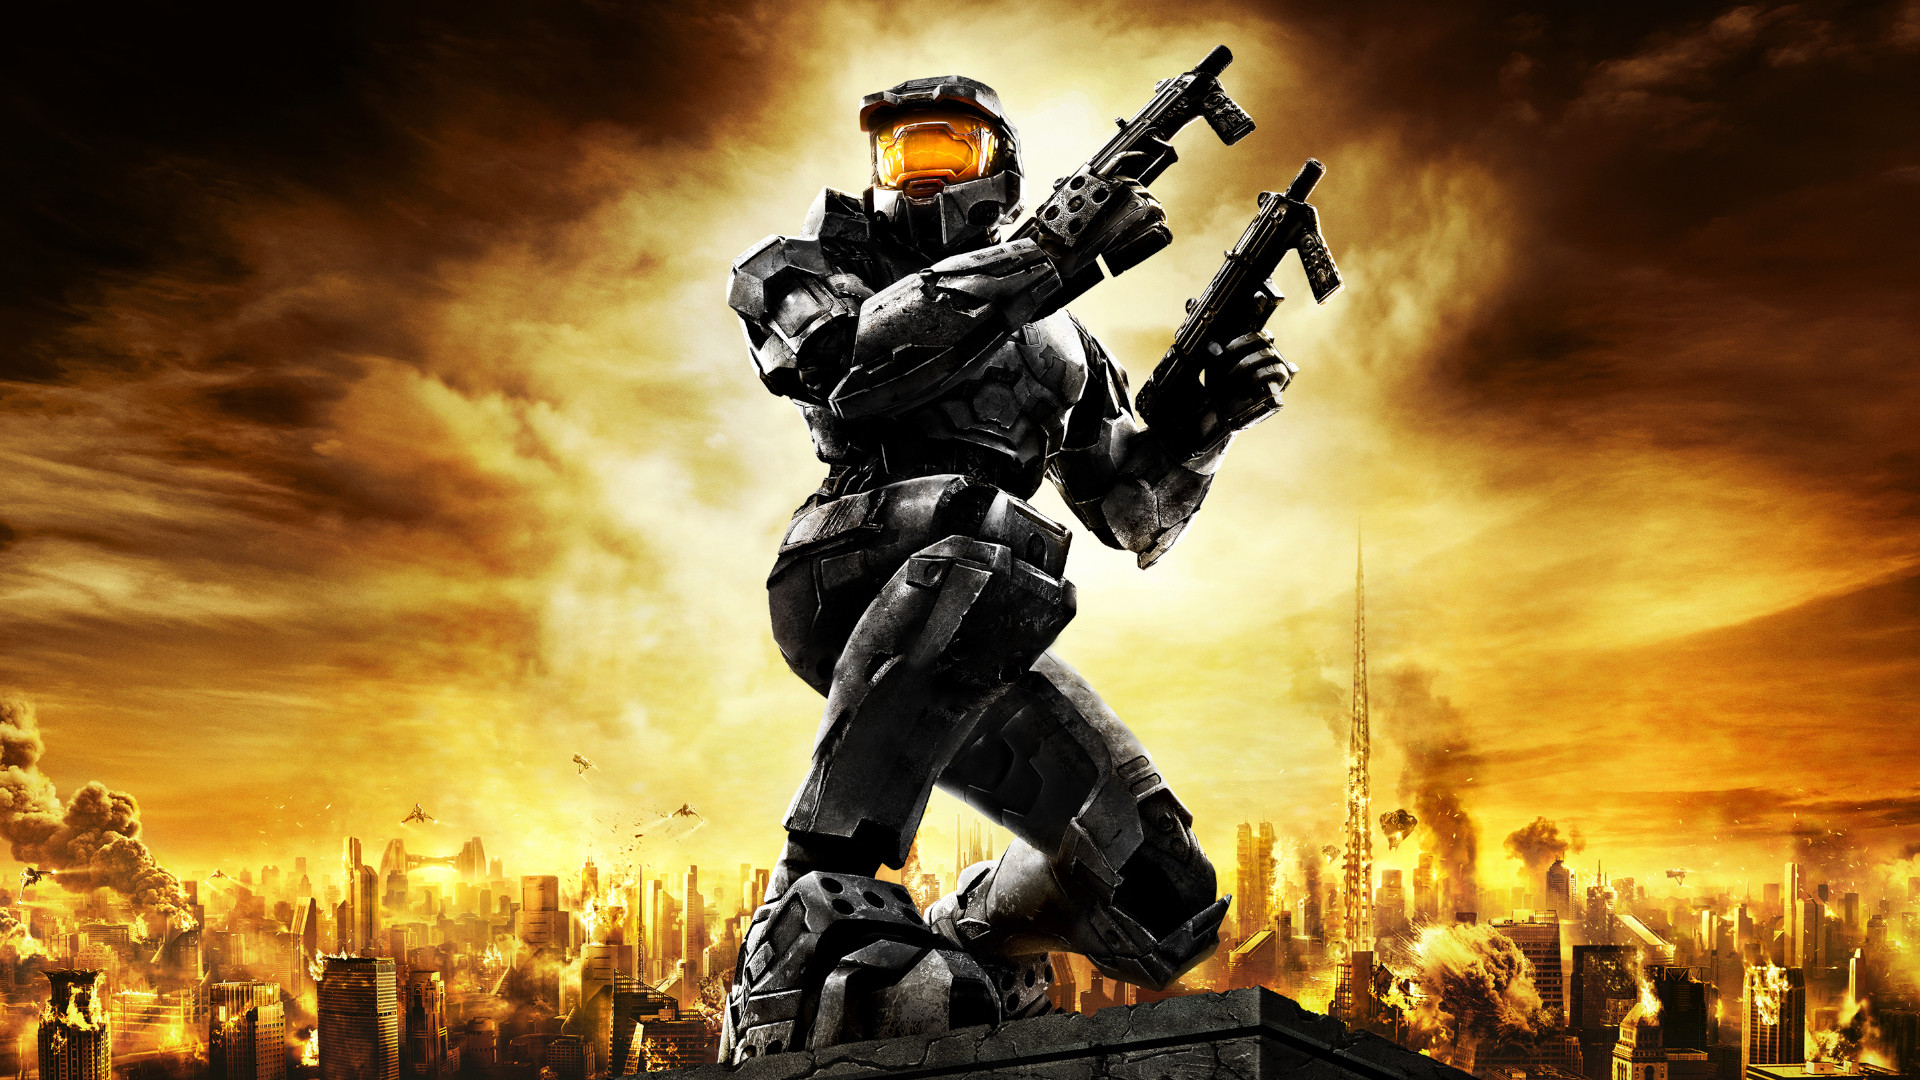 Res: 1920x1080, Halo 2 Anniversary Soundtrack 1080p Wallpaper No Text ...